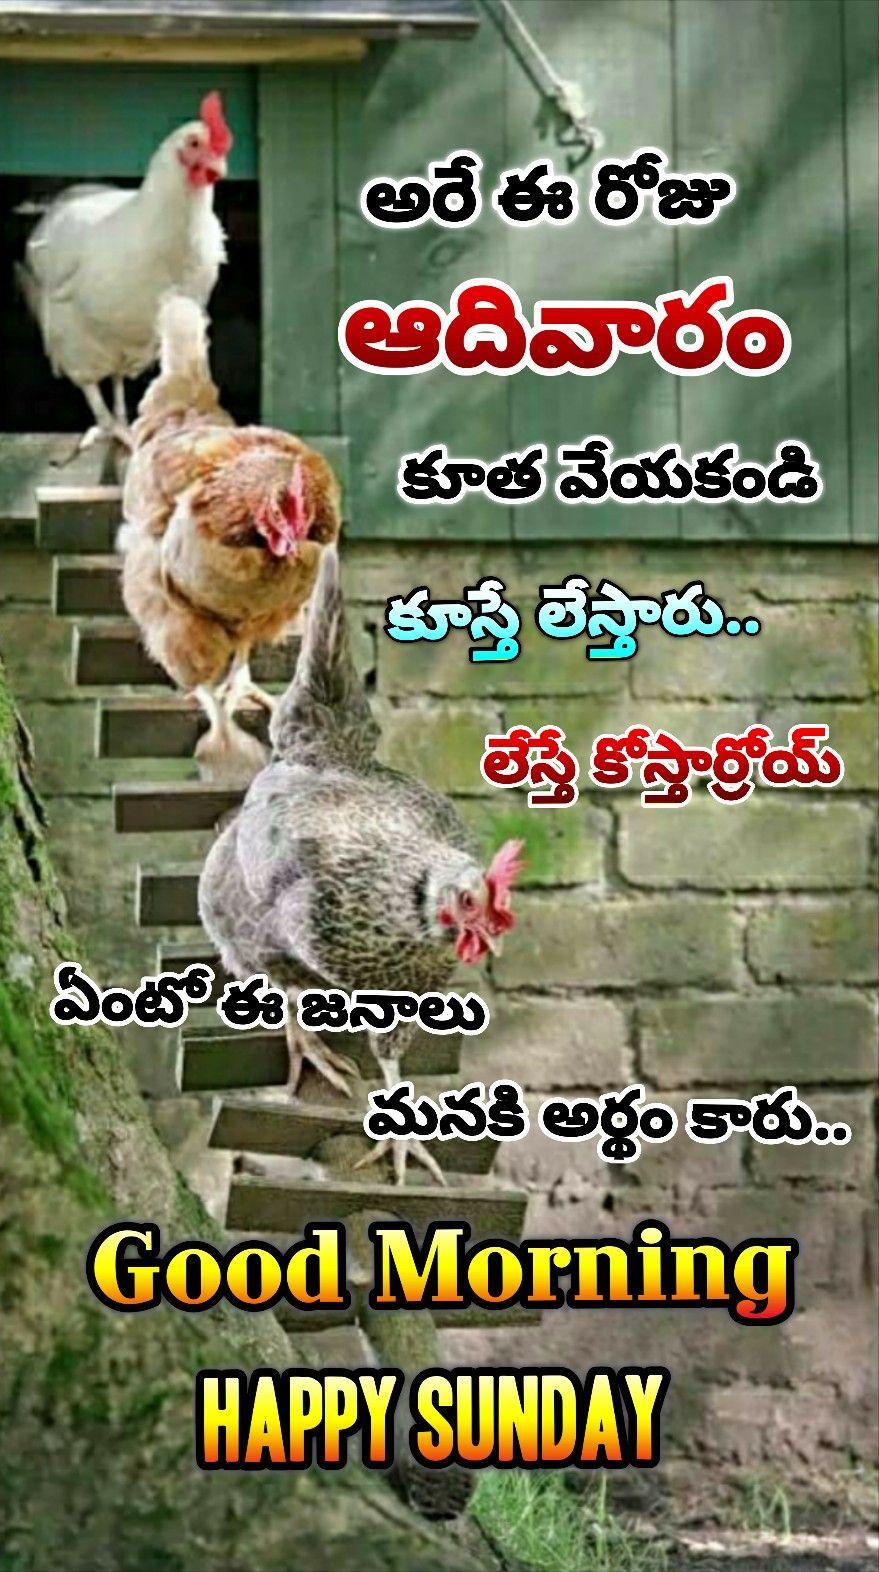 Pin By Sirikonda Rakesh On Quotes Good Morning Happy Sunday Good Morning Happy Happy Sunday